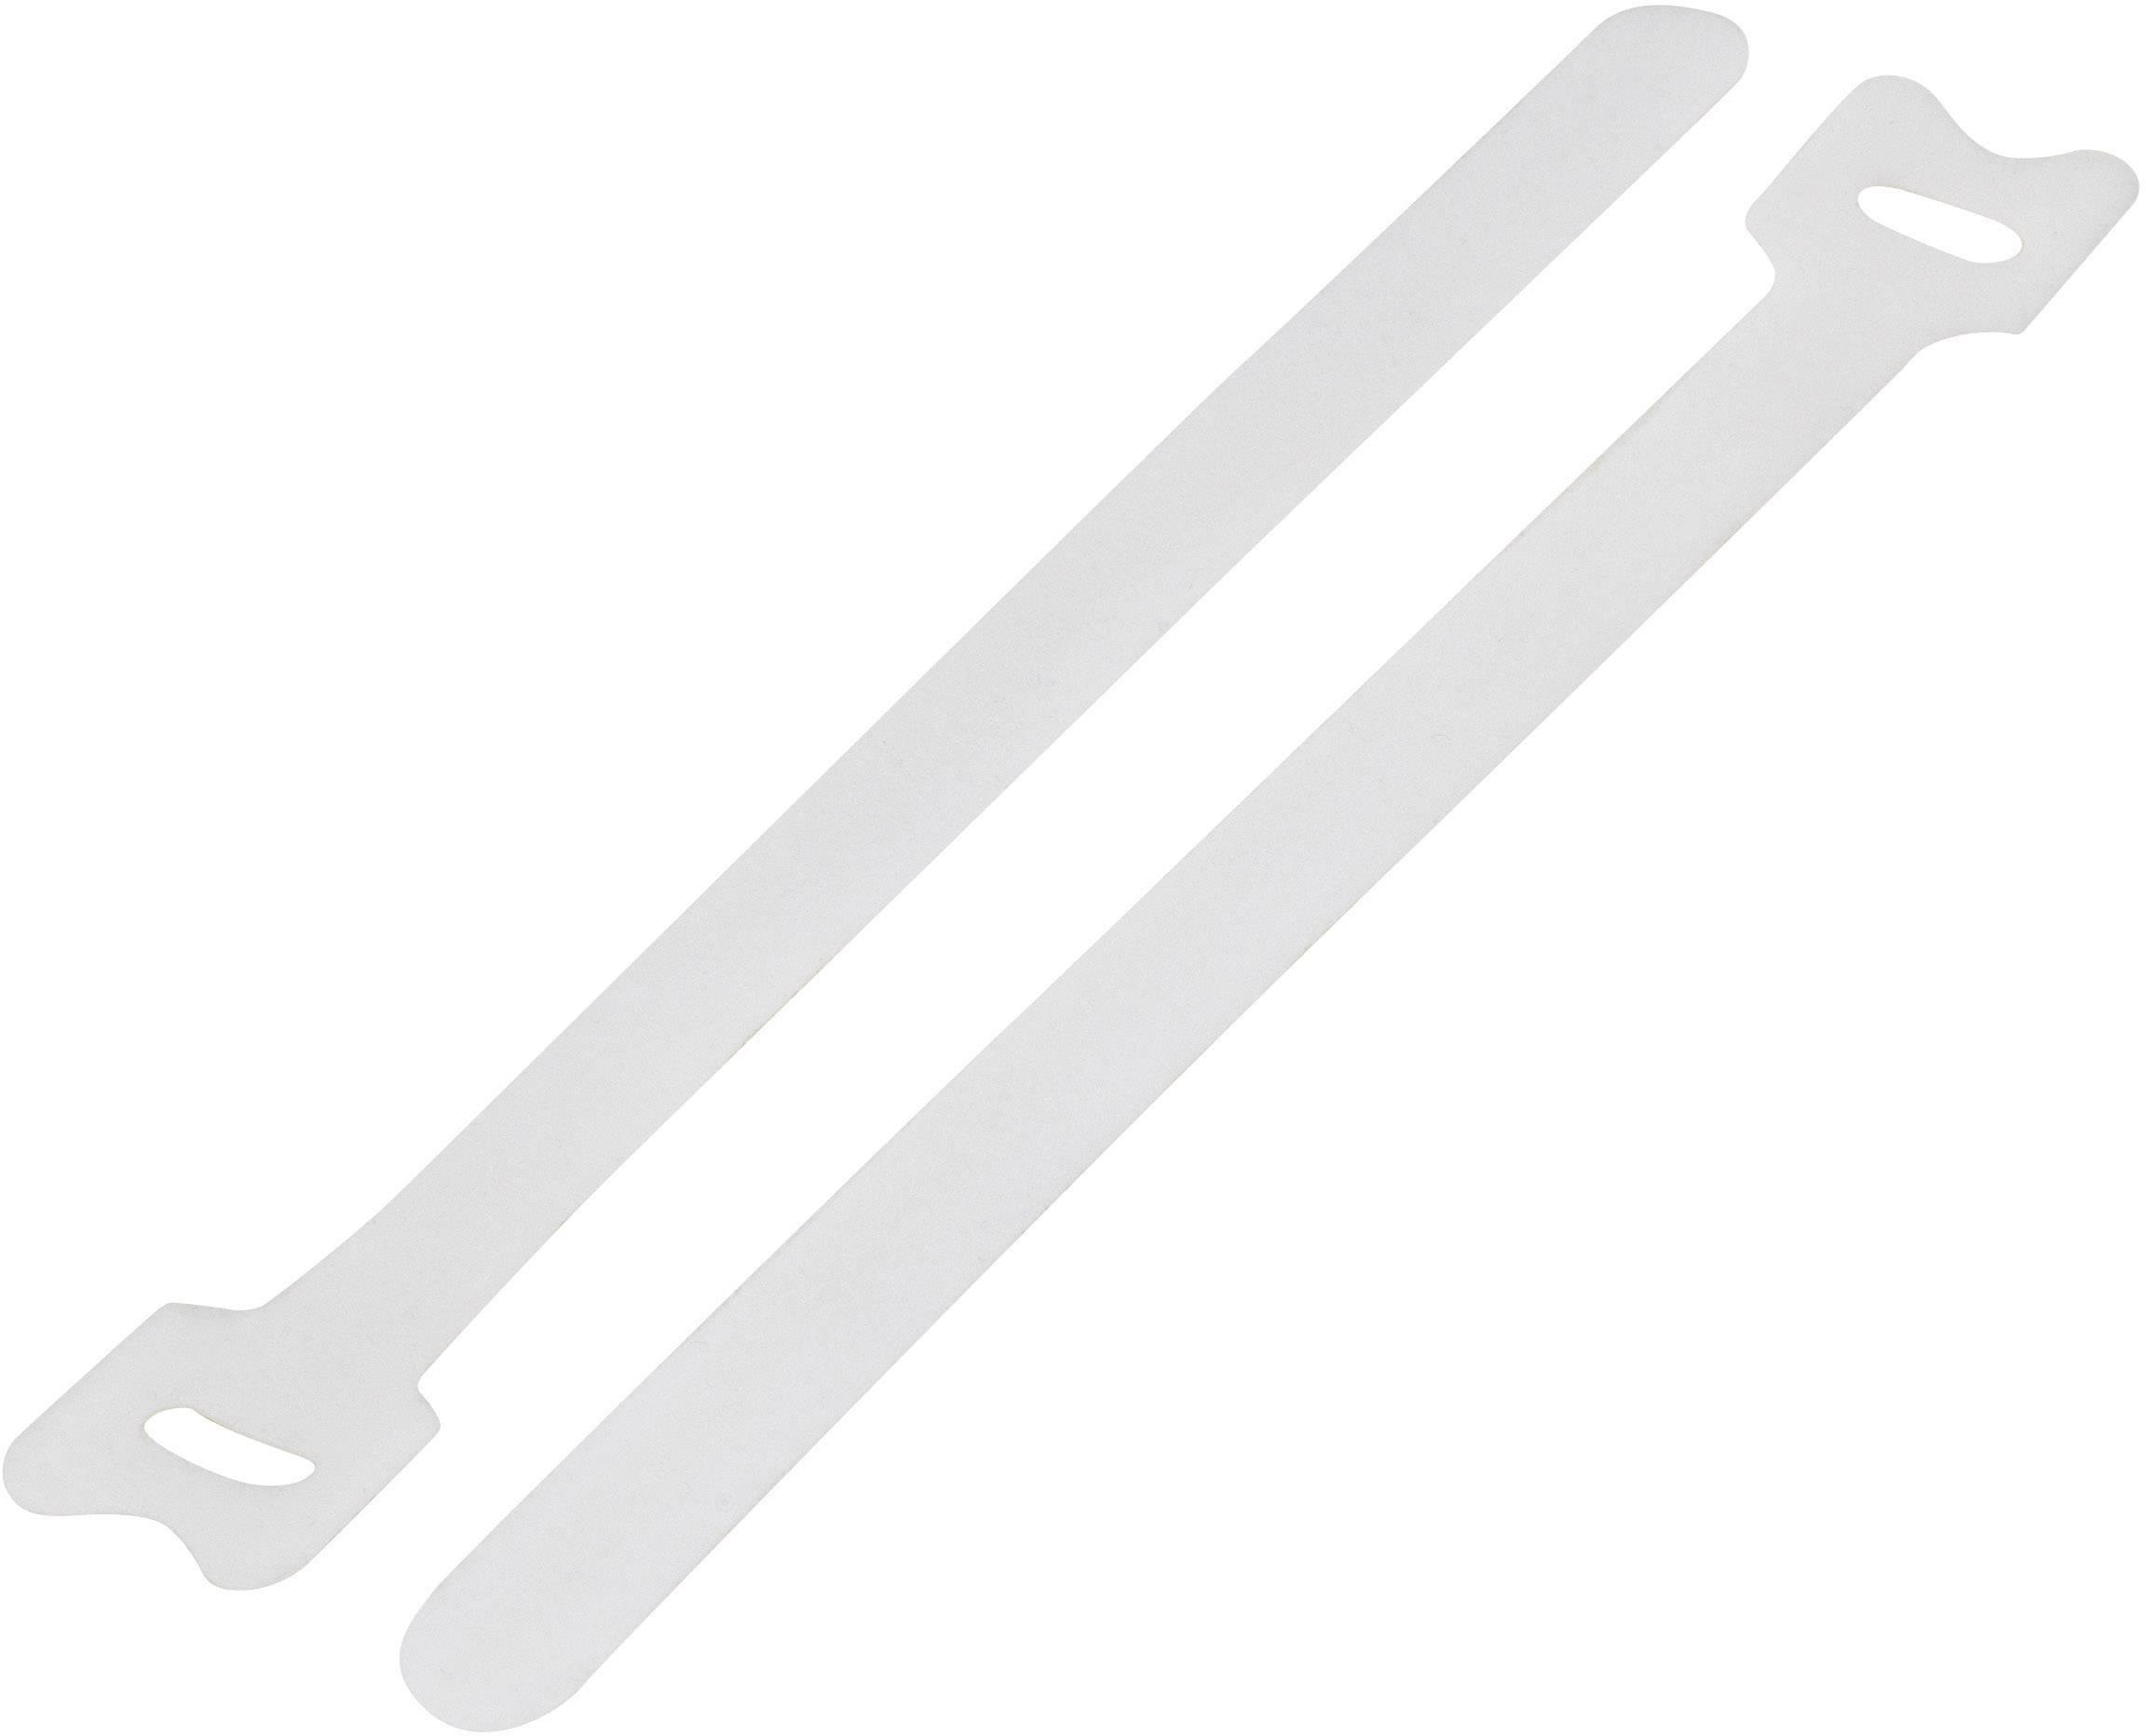 Kabelový manažer na suchý zip TRU COMPONENTS TC-MGT-240WE203, (d x š) 240 mm x 16 mm, bílá, 1 ks